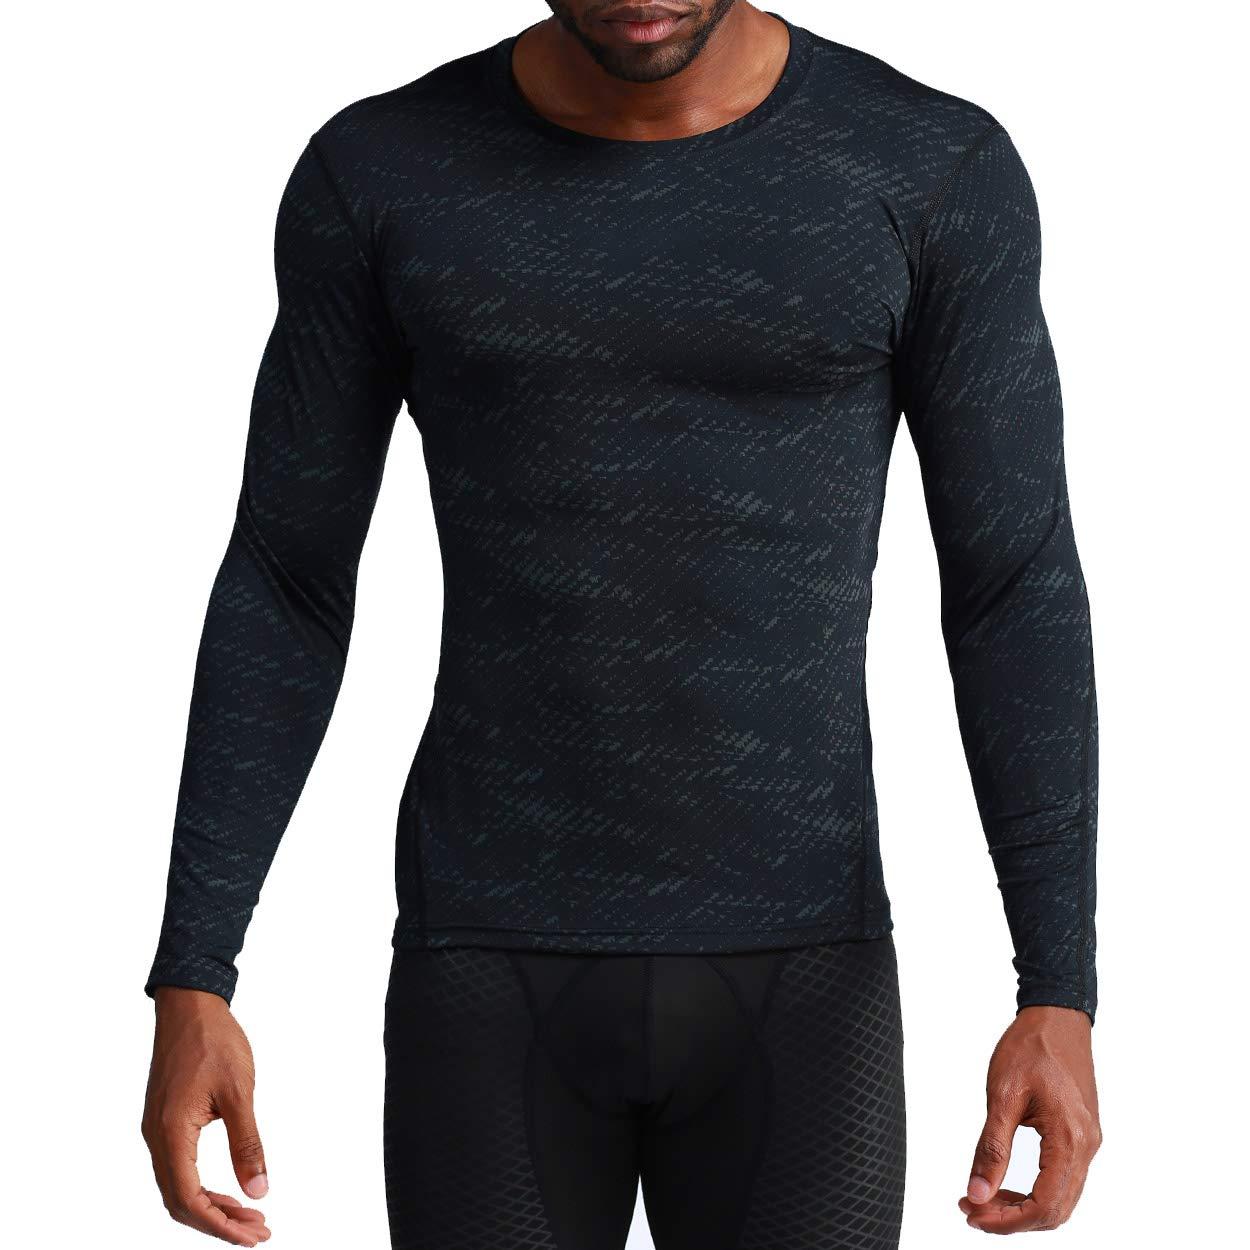 e9b366c0b72 Amazon.com  NEKO SPORTS Mens Long Sleeve T Shirts Cool Dry Compression  Shirt Long Sleeve Workout Shirts for Men  Clothing